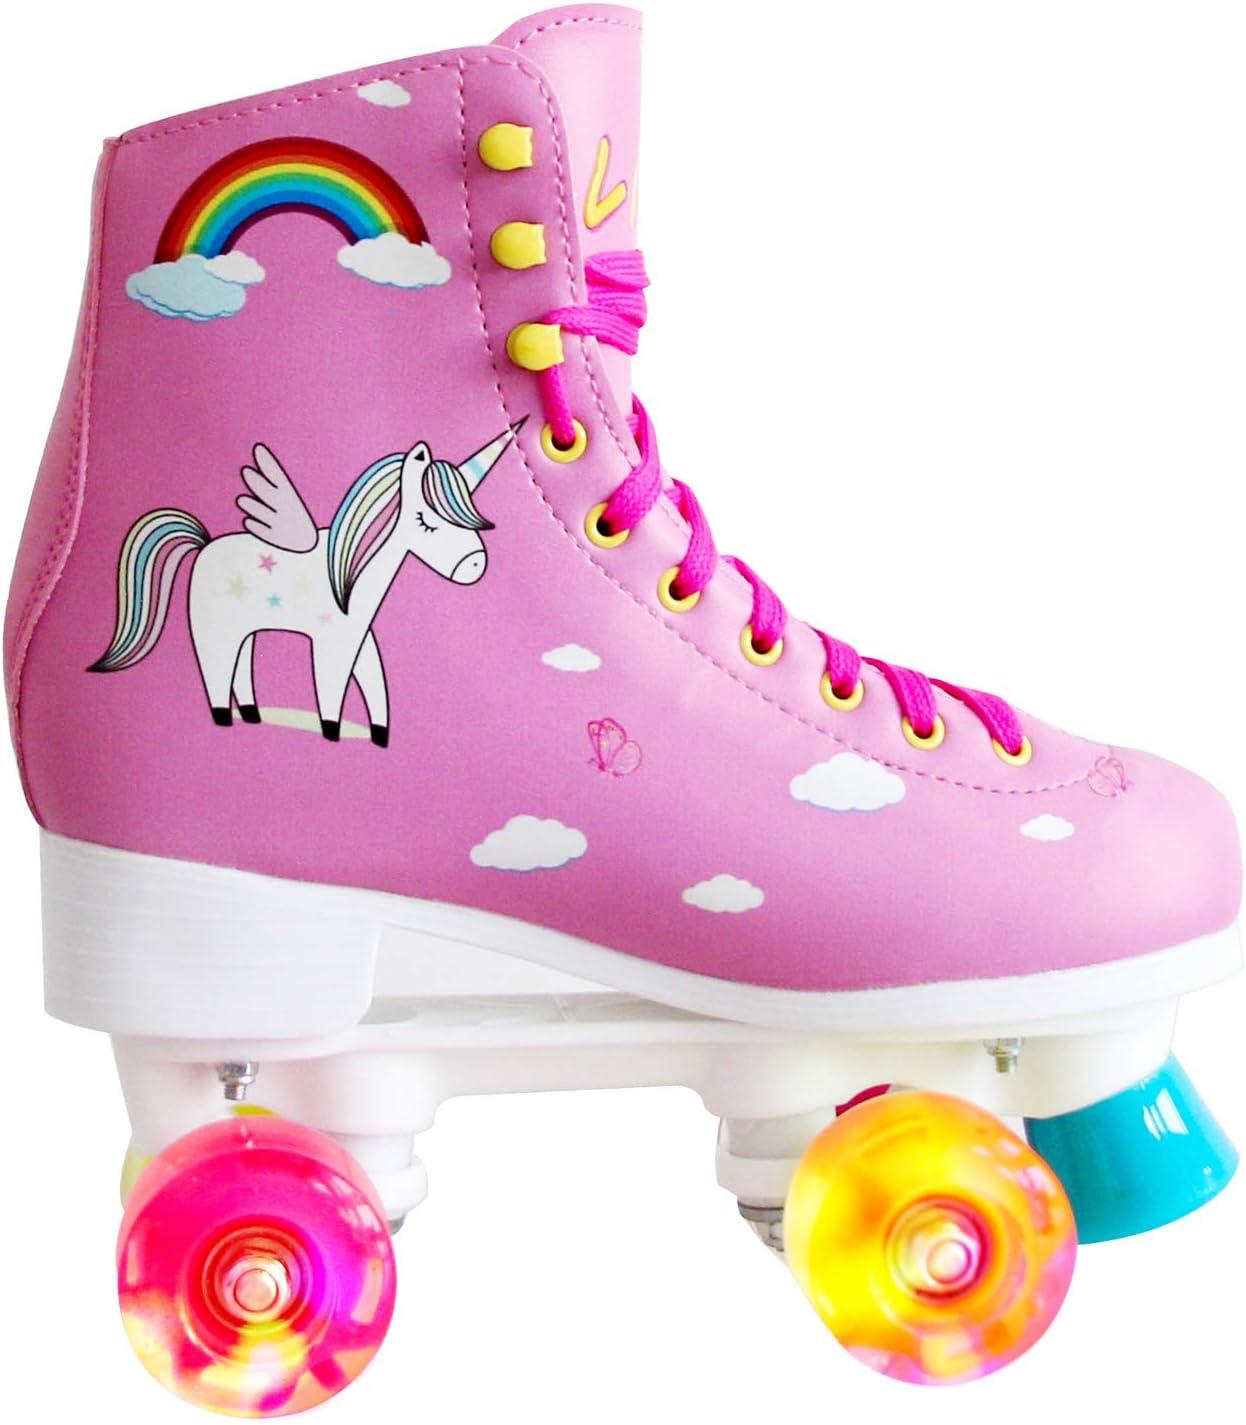 LIKU Quad Roller Skates